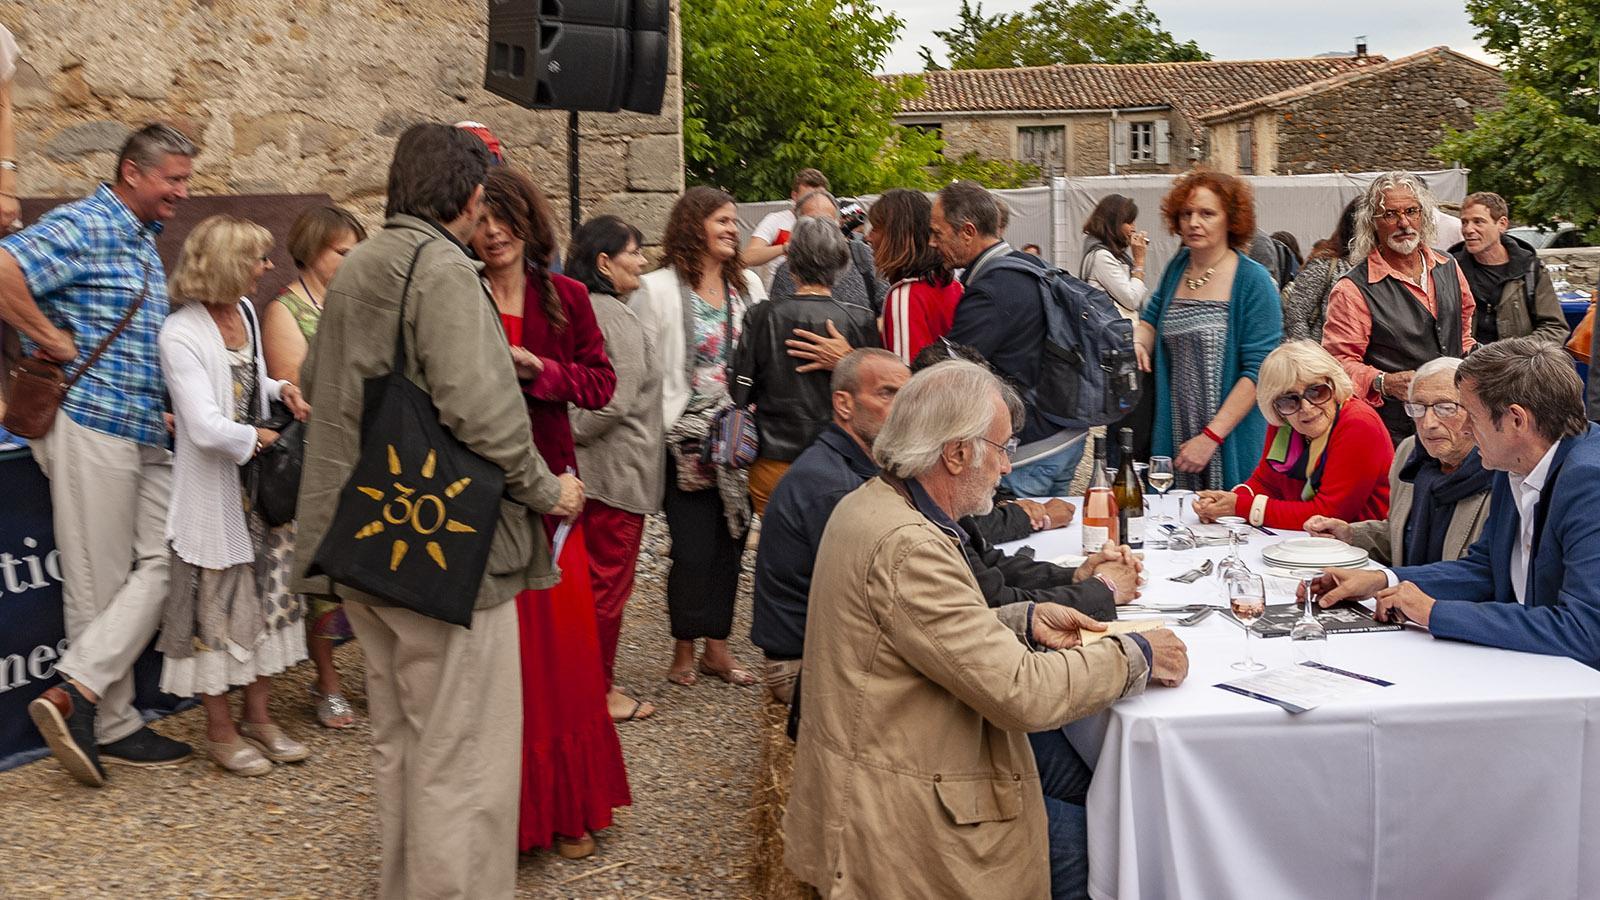 Festival du Film Insolite 2019. Foto: Hilke Maunder